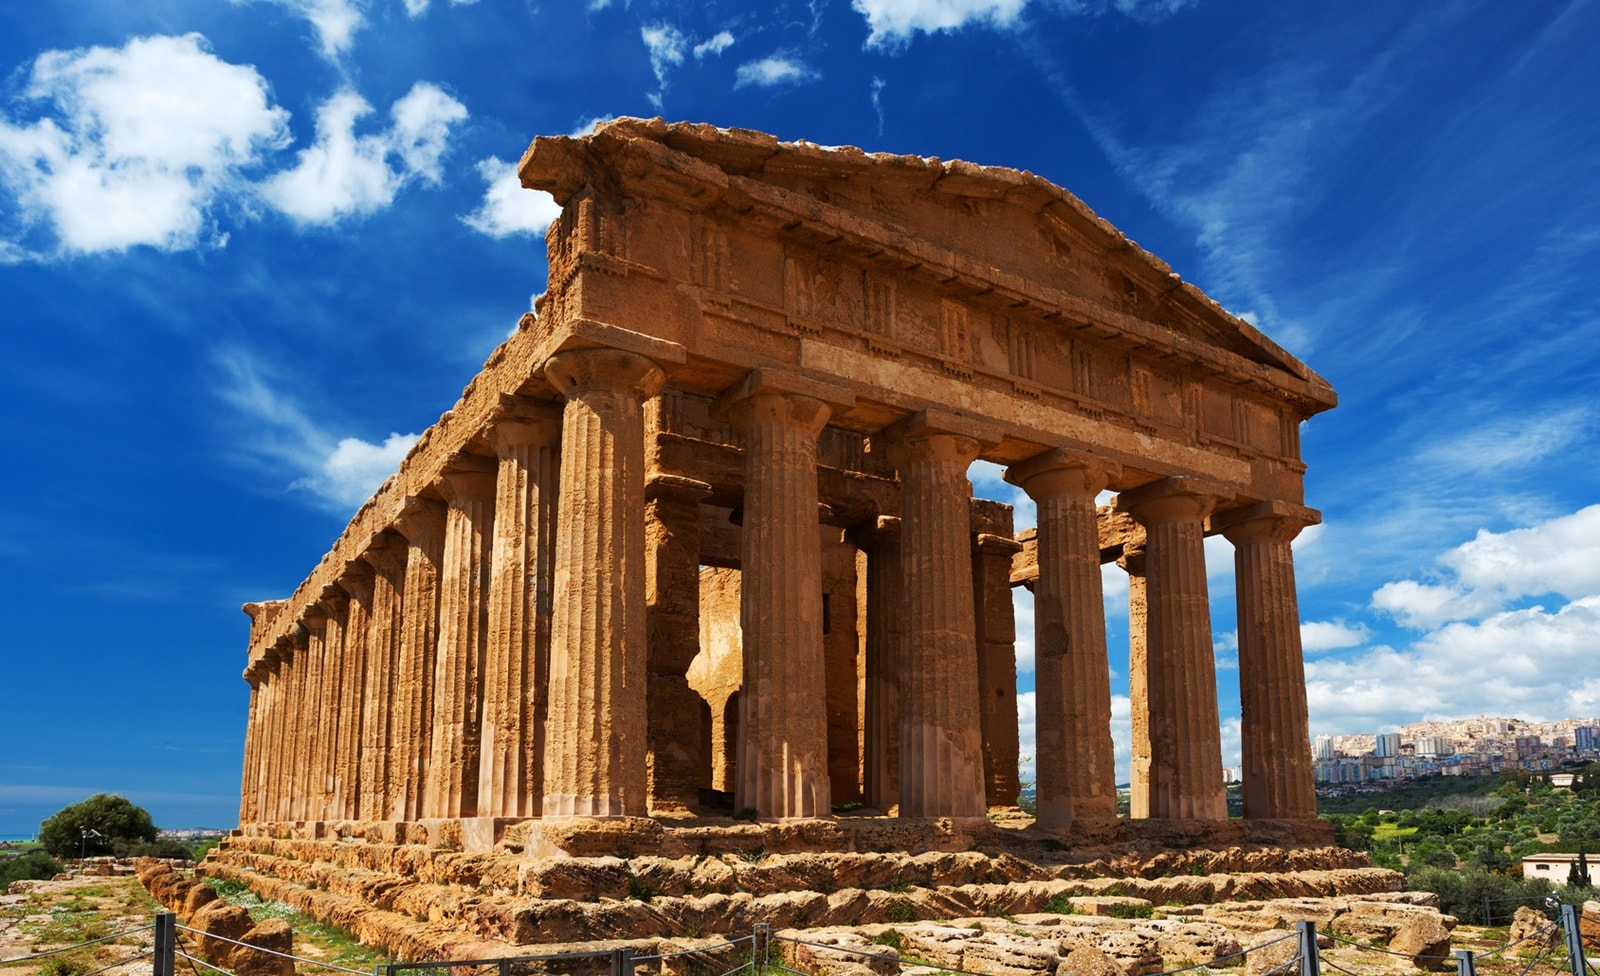 Tal der Tempel auf Sizilien